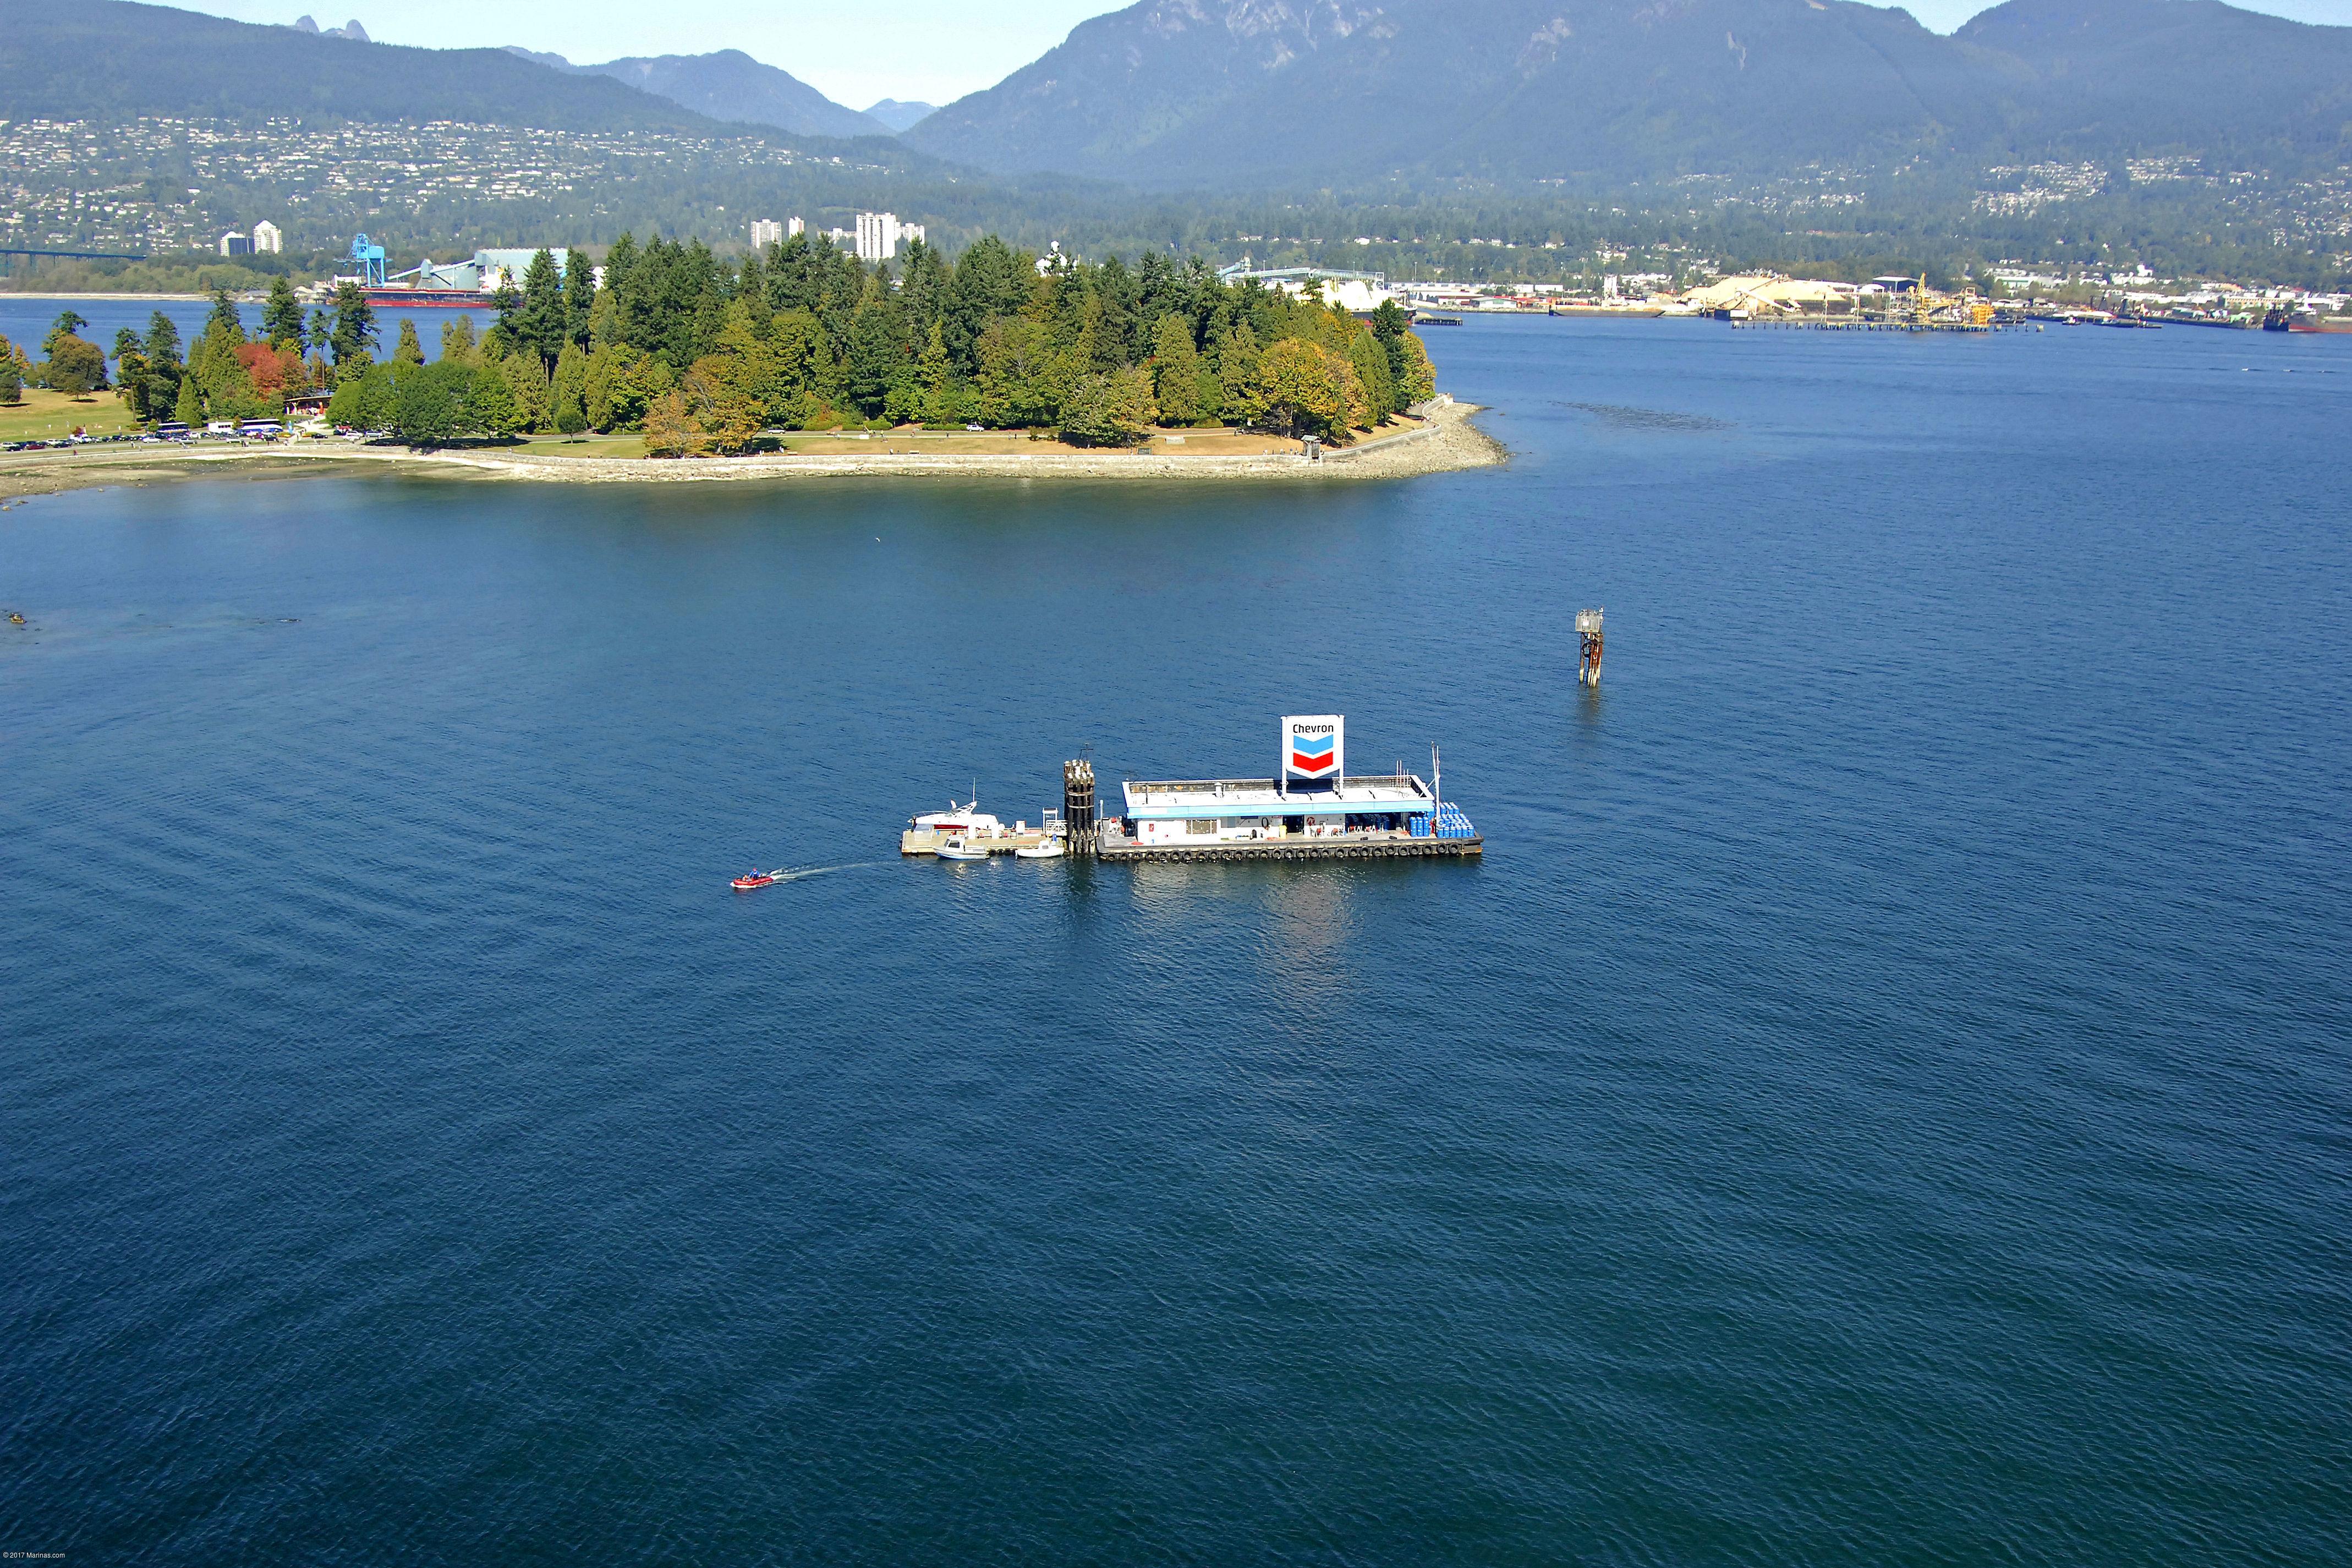 Coal Harbour Chevron in Vancouver, BC, Canada - Marina Reviews - Phone Number - Marinas.com